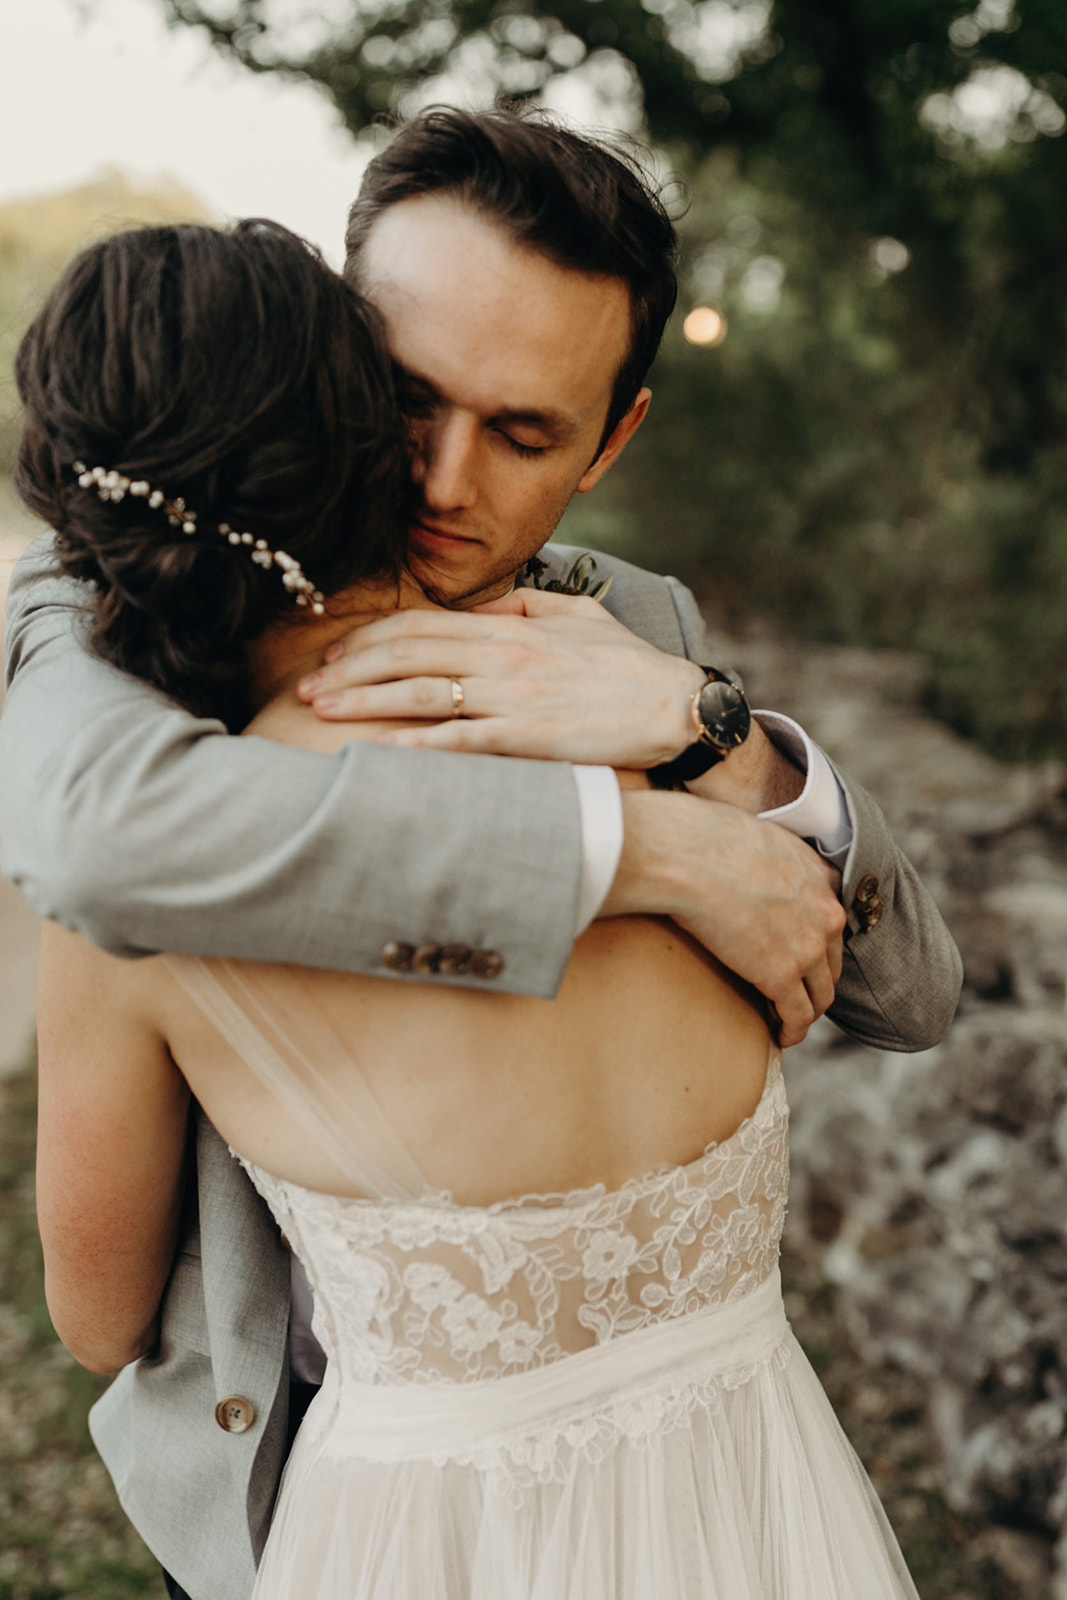 austin-wedding-lindsey-bryce-554.jpg